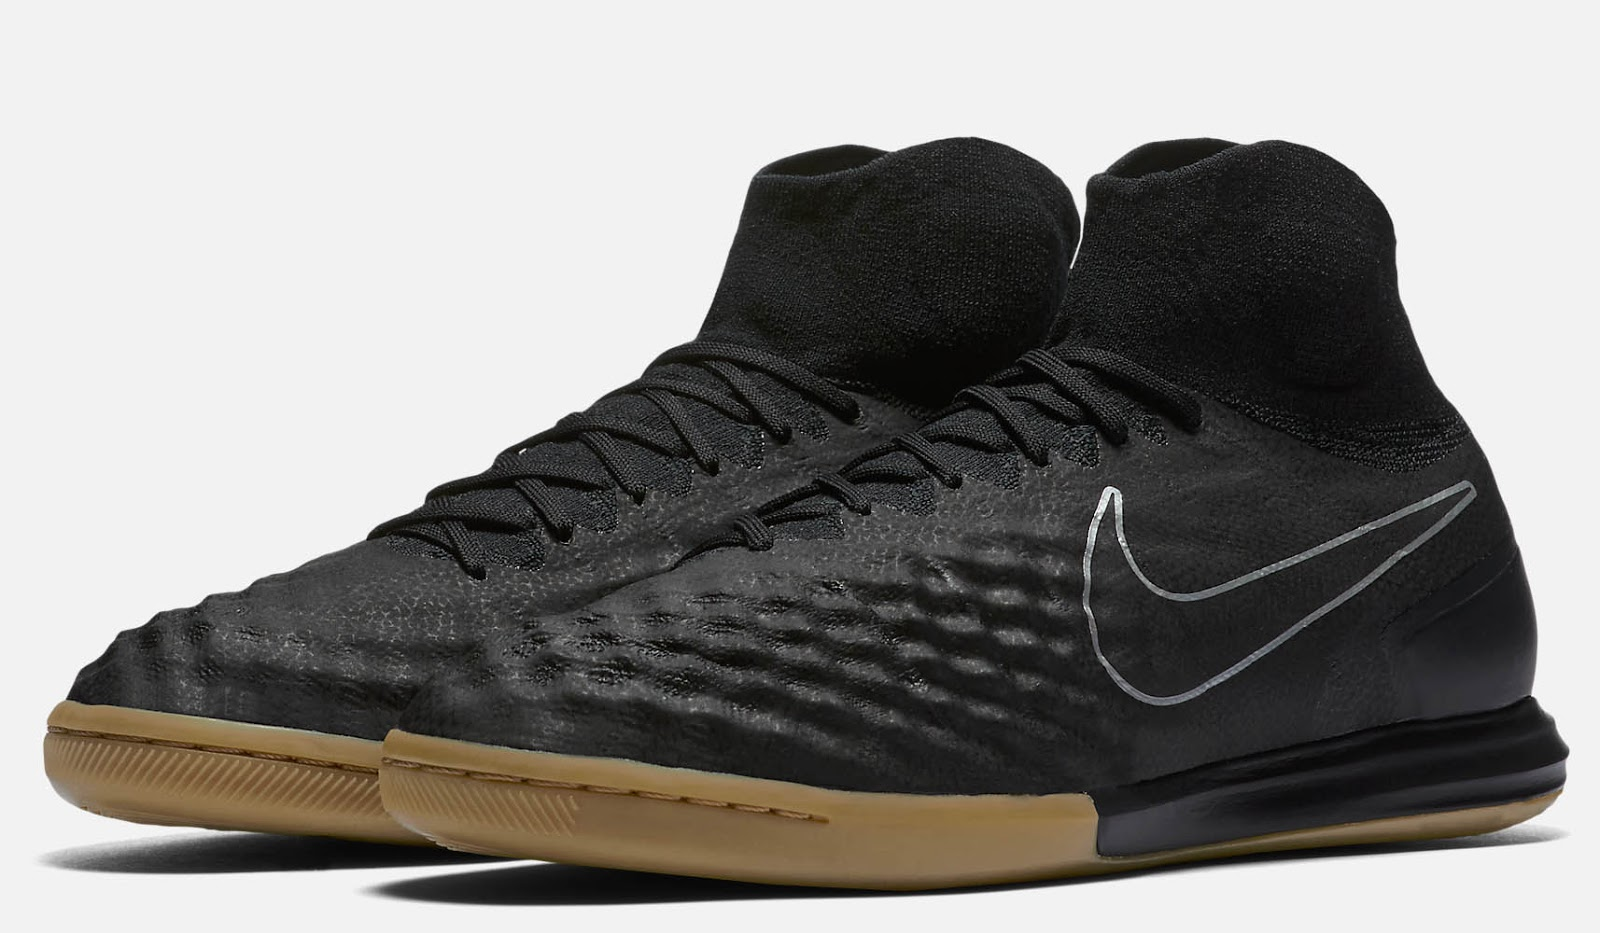 c3b6deb6409e Nike MagistaX Proximo II IC Indoor Soccer Shoes (SeaweedVoltHastaMica Black  Gum Next-Gen Nike MagistaX Proximo II 2016 Boots Released - Footy Headlines  .